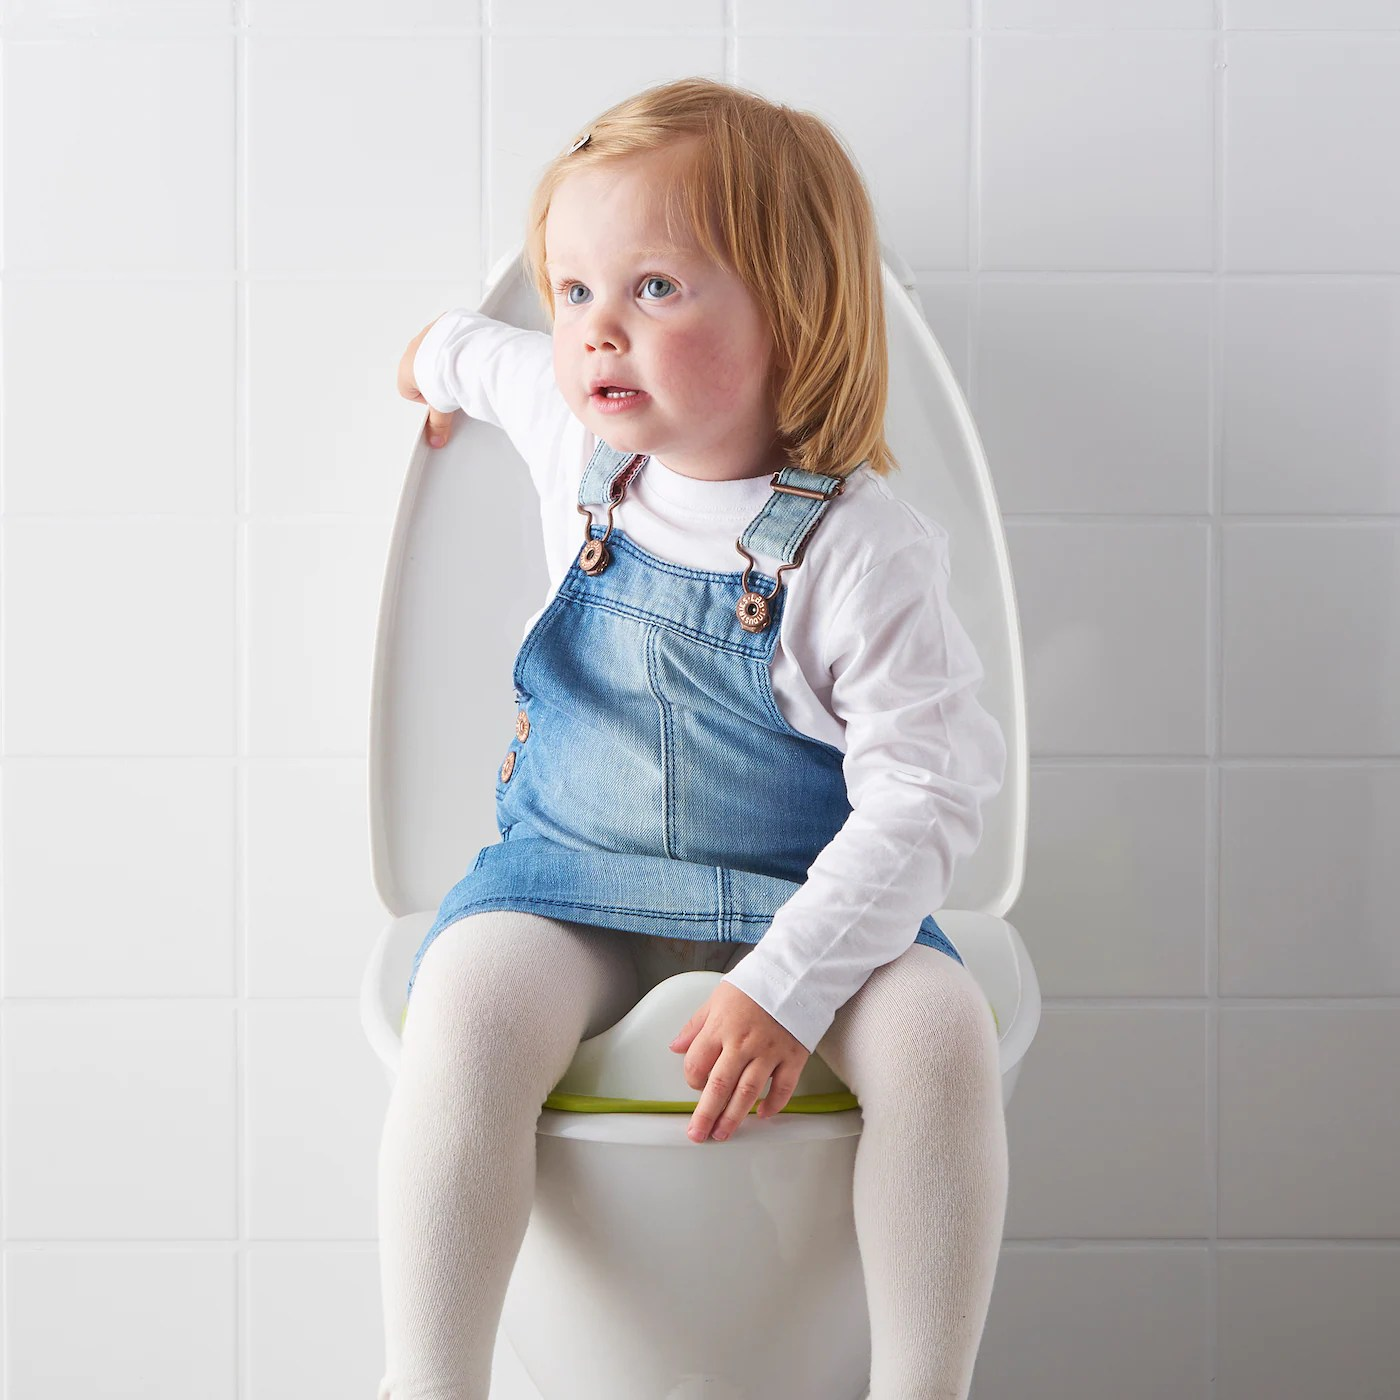 Tossig Toiletsaede Hvid Gron Ikea